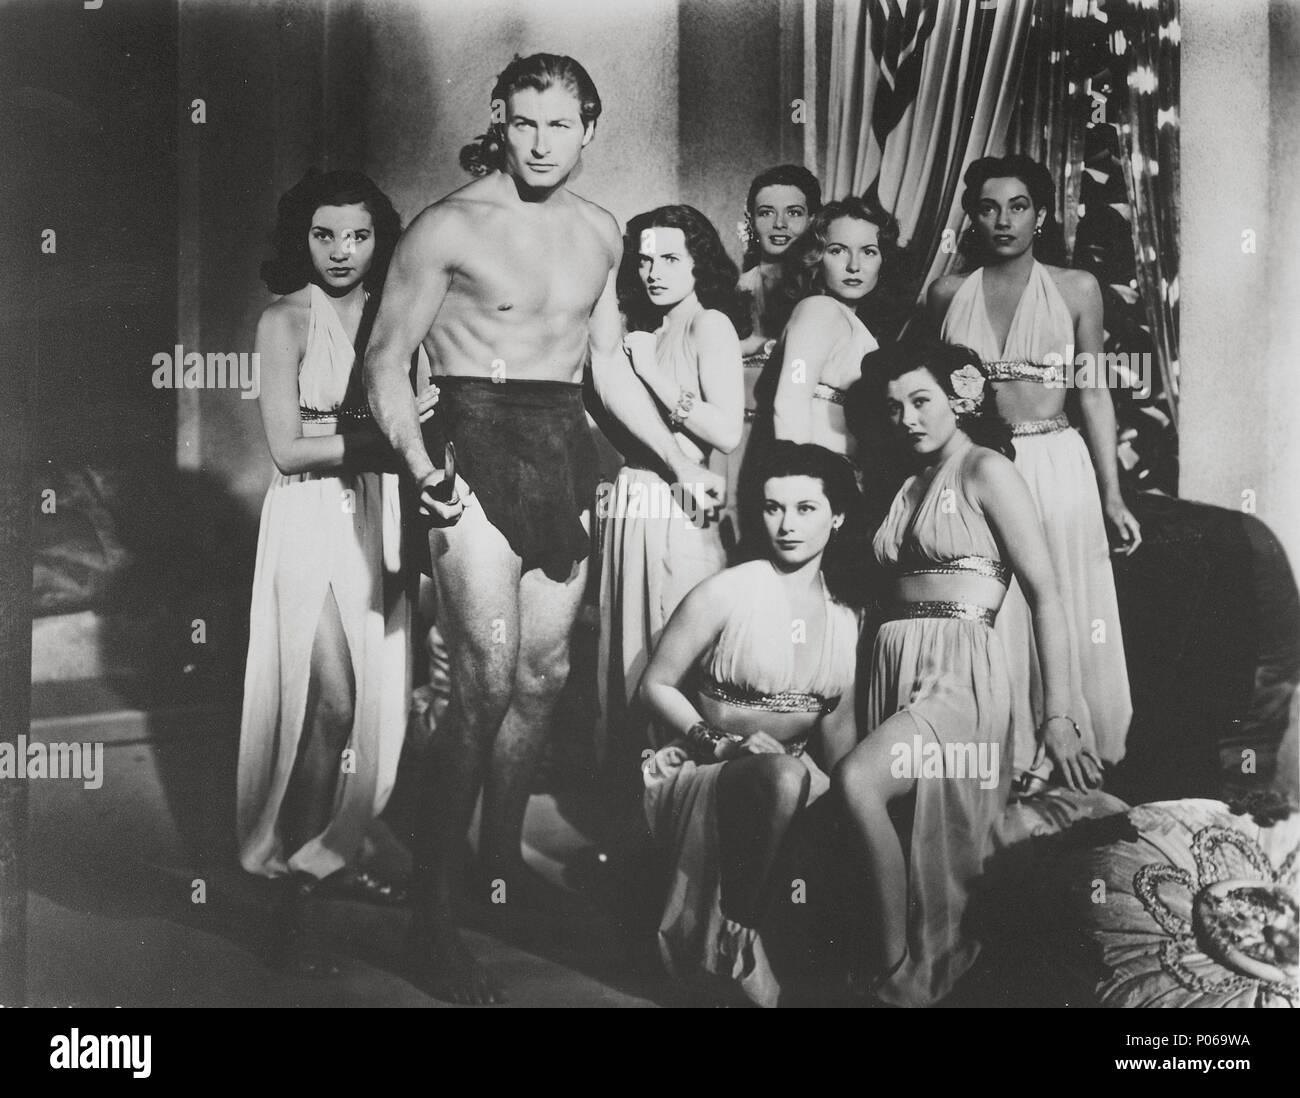 Original Film Title: TARZAN AND THE SLAVE GIRL.  English Title: TARZAN AND THE SLAVE GIRL.  Film Director: LEE SHOLEM.  Year: 1950.  Stars: LEX BARKER. Credit: RKO / Album - Stock Image